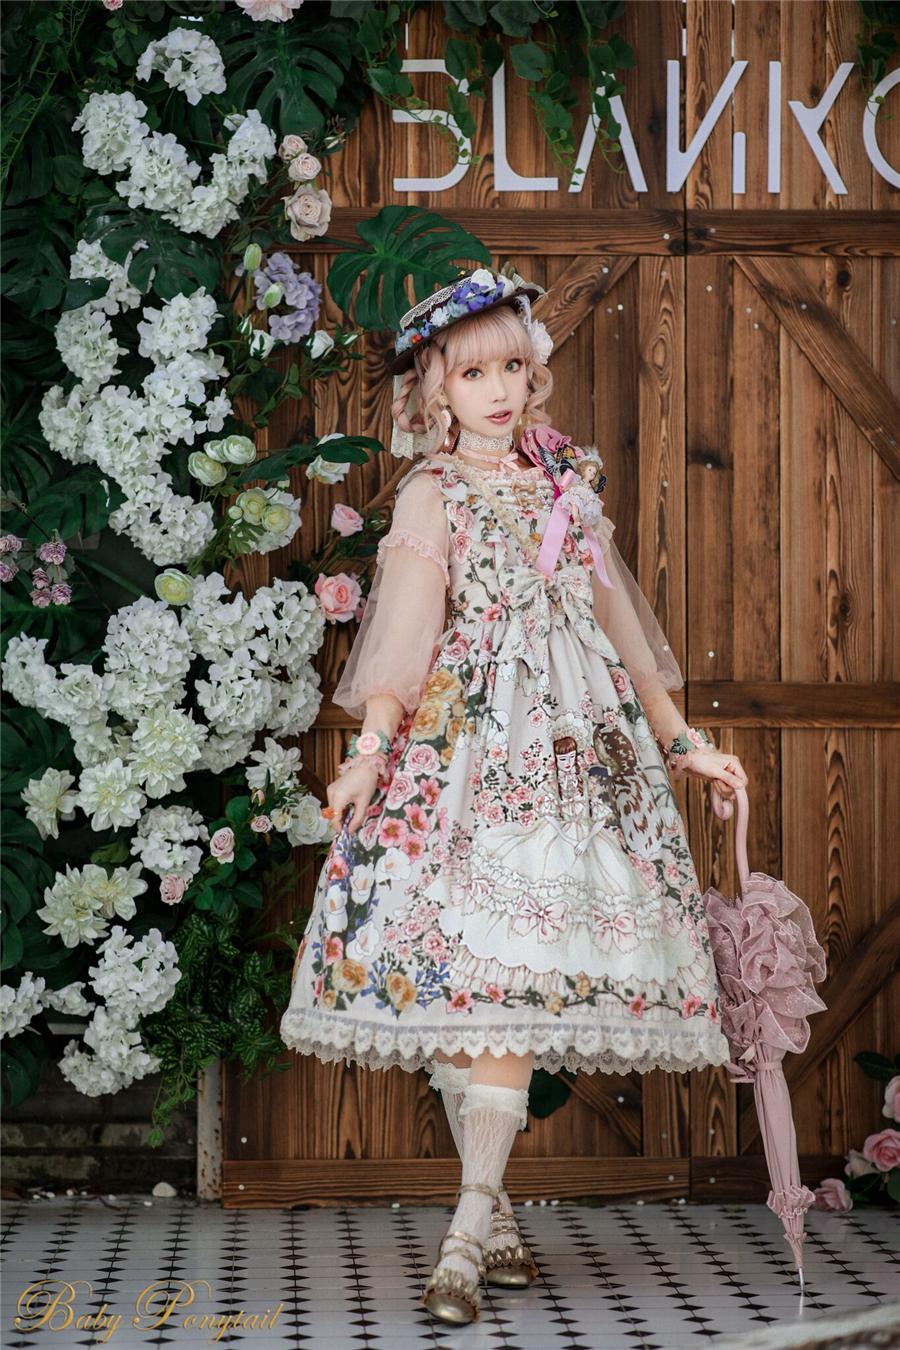 Polly's Garden of Dreams_Model Photo_Ivory JSK_Kaka_03.jpg